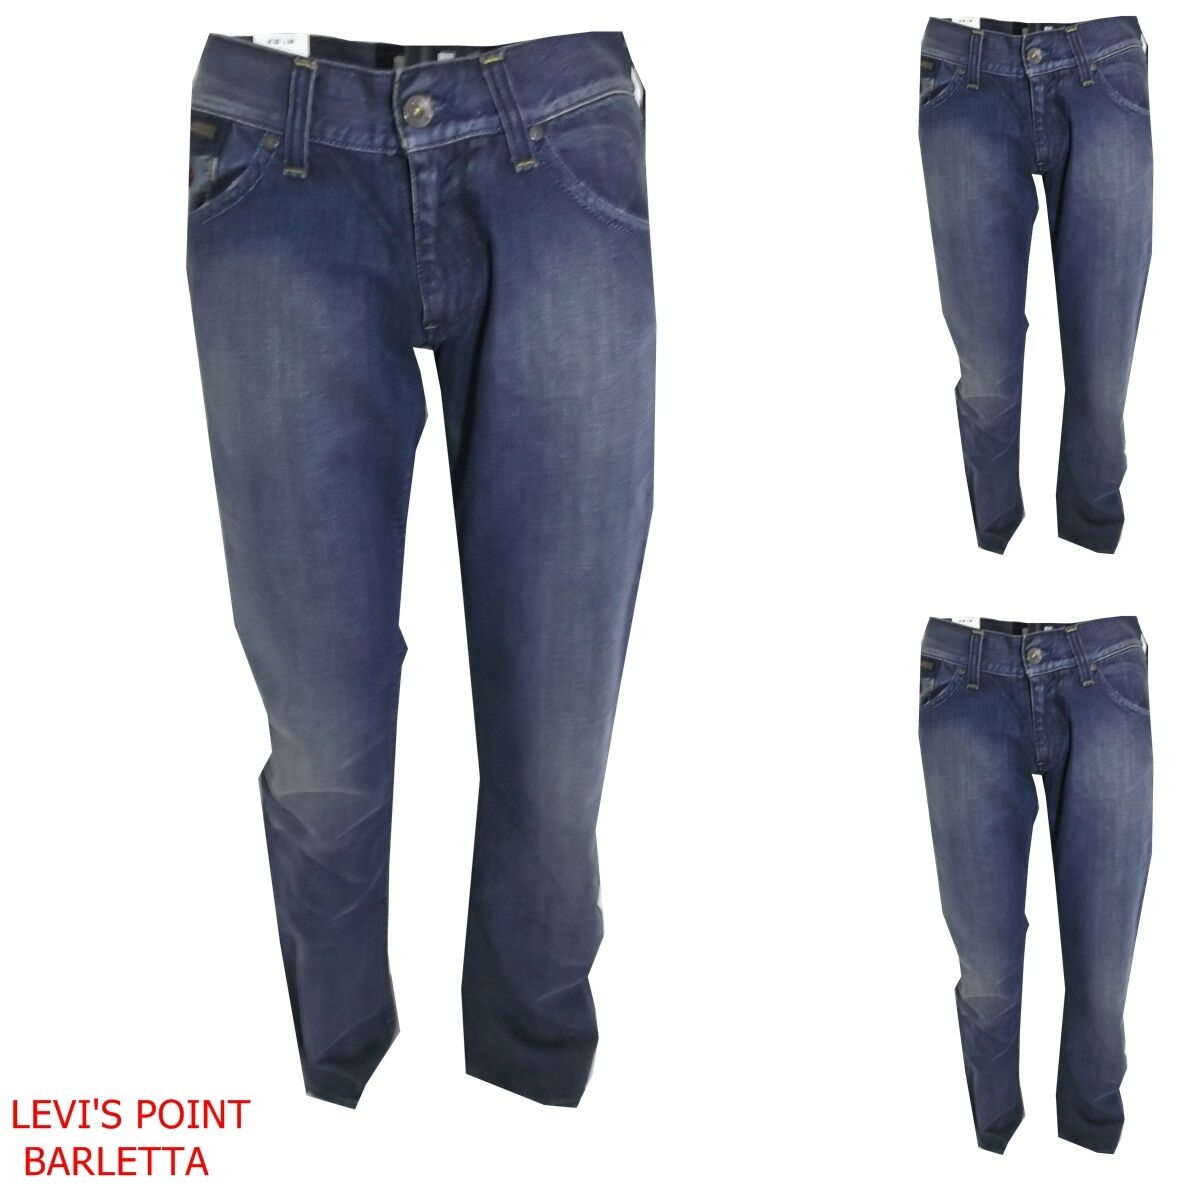 Jeans a zampa d'elefante denim svasato energie uomo morris Slim taglia W28 W32